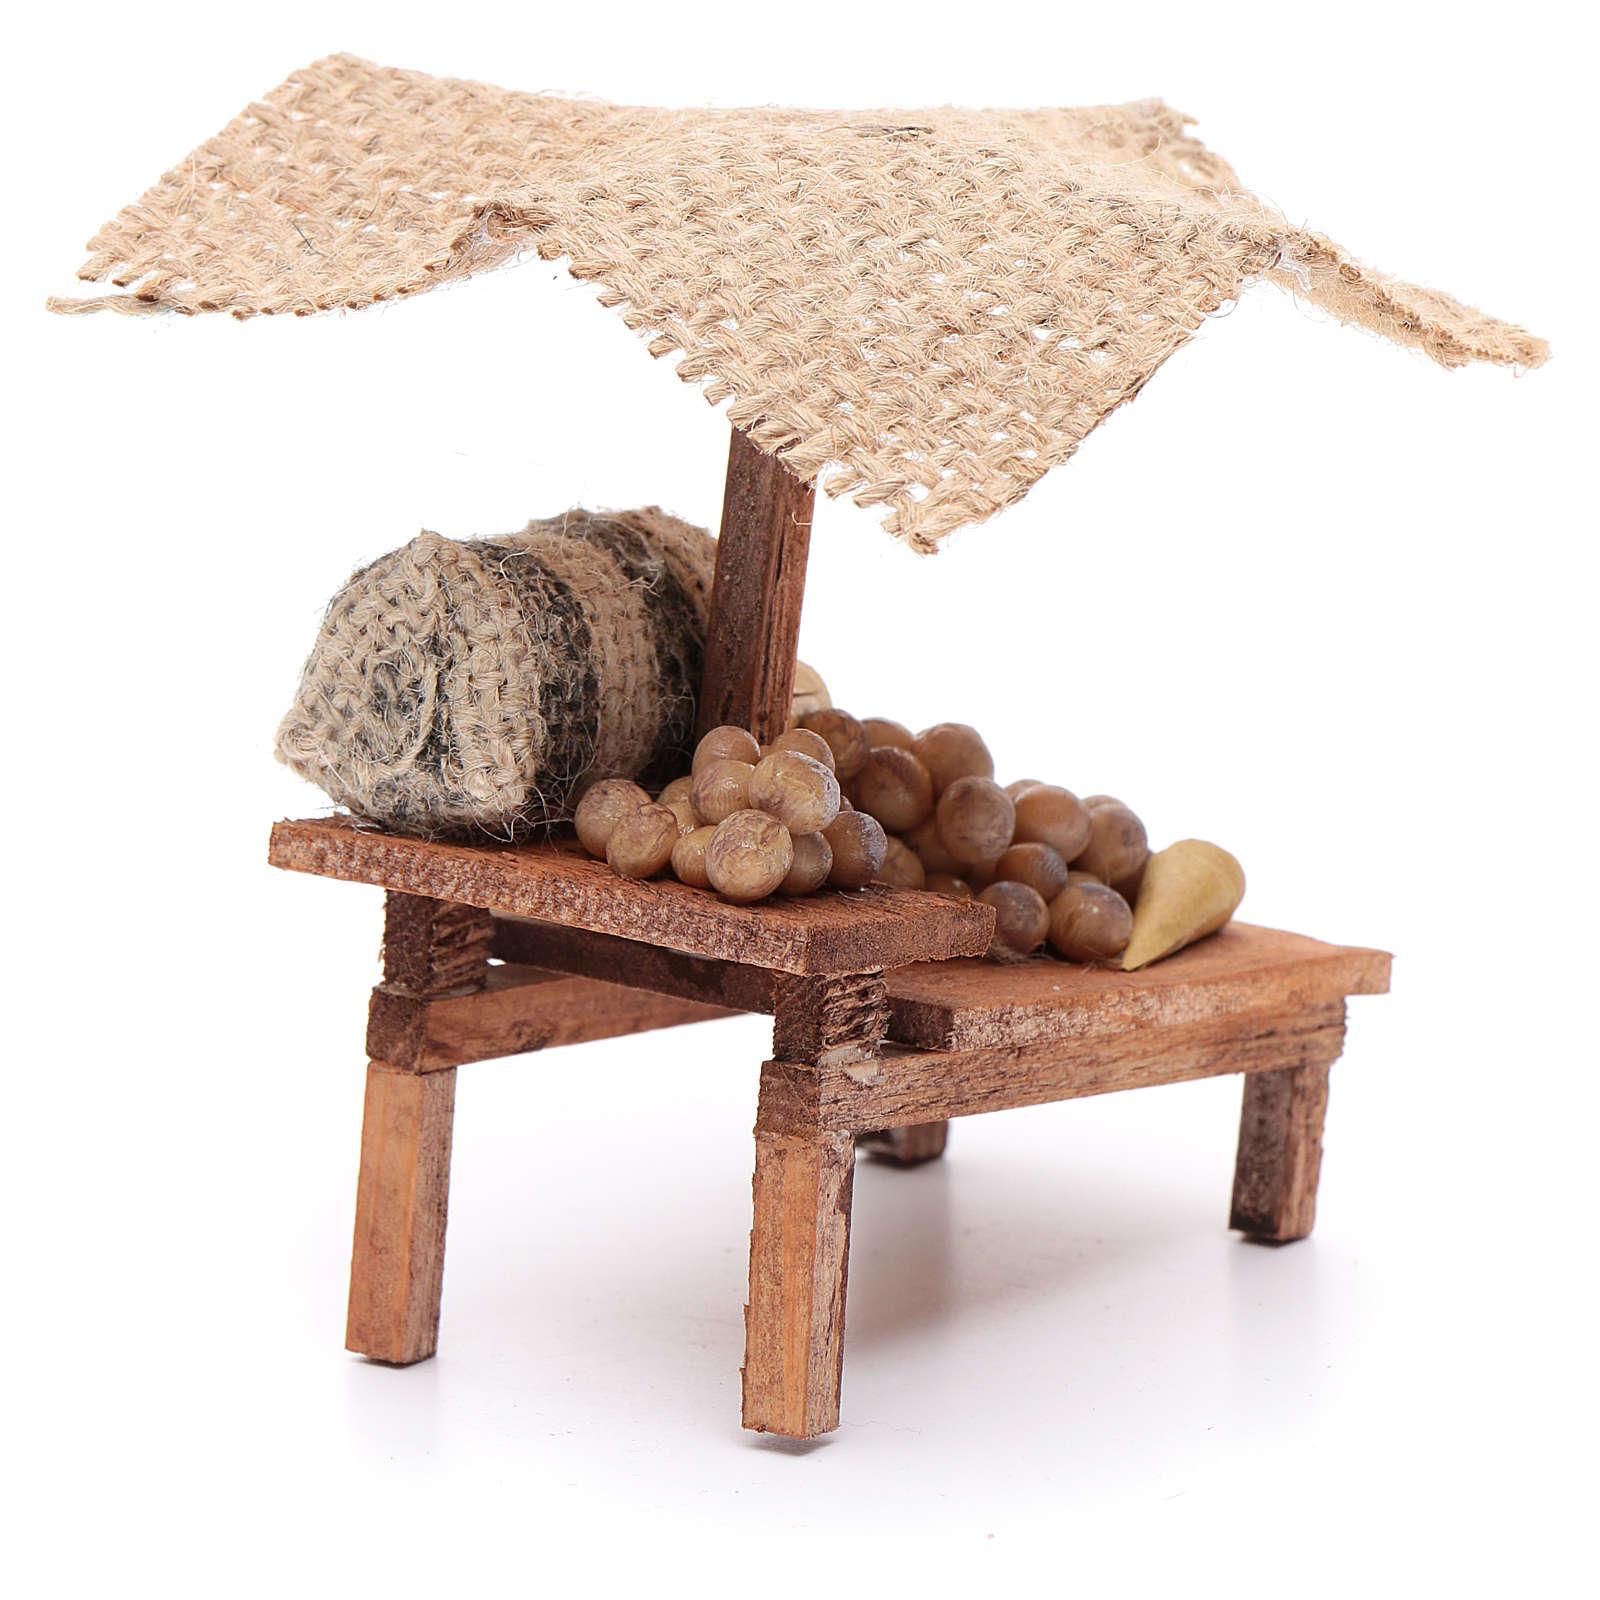 Mostrador patatas 10x10x5 cm 4